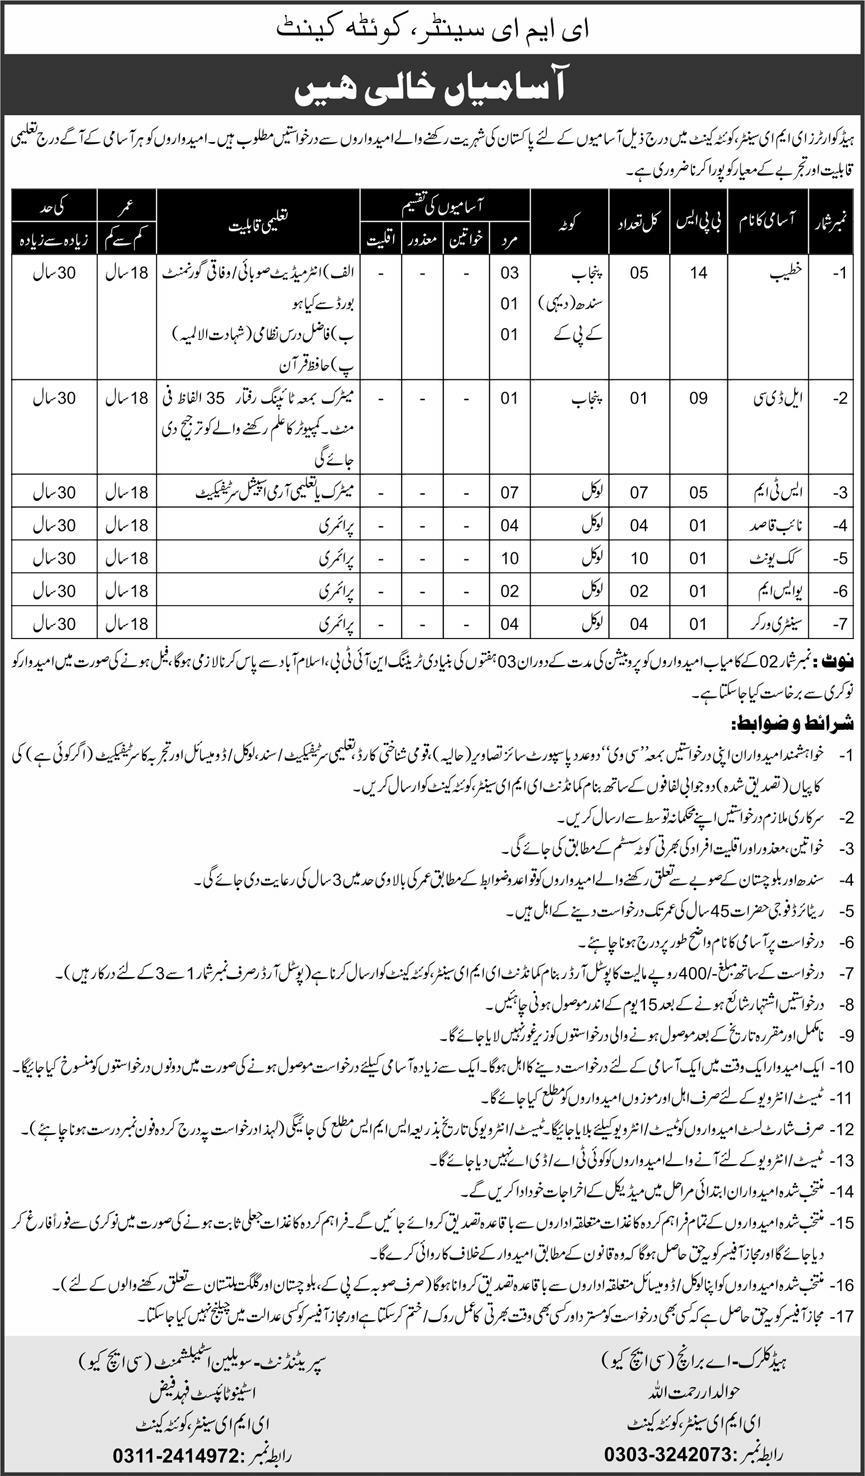 Pak Army Headquarters EME Center Quetta Cantt Jobs 2021 in Pakistan